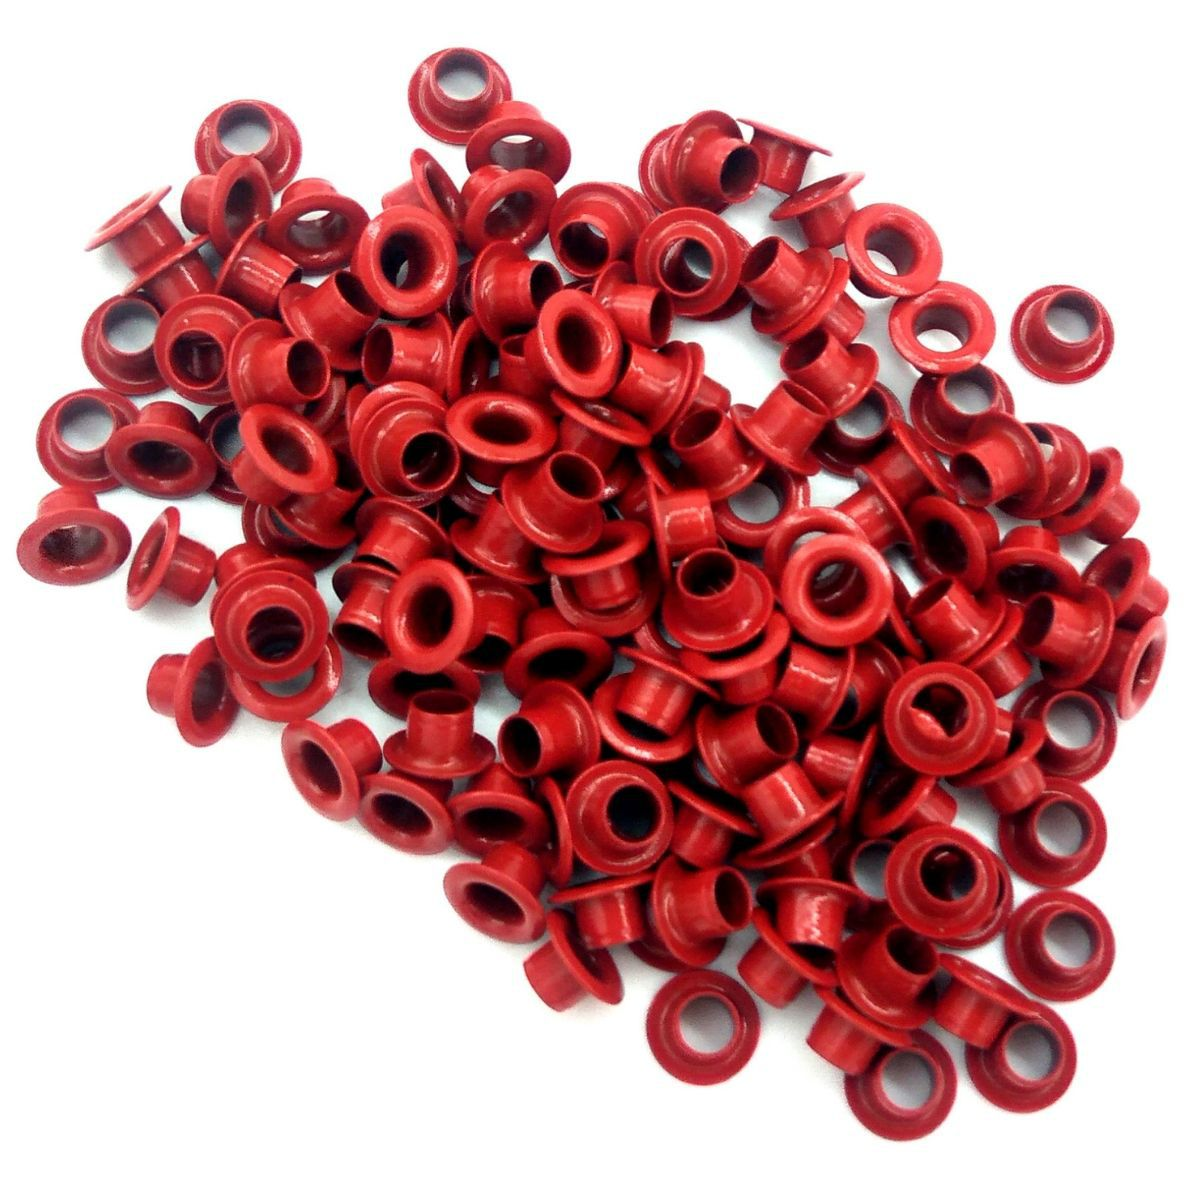 Ilhós Nº 54 Alumínio 8mm Externo - Vermelho